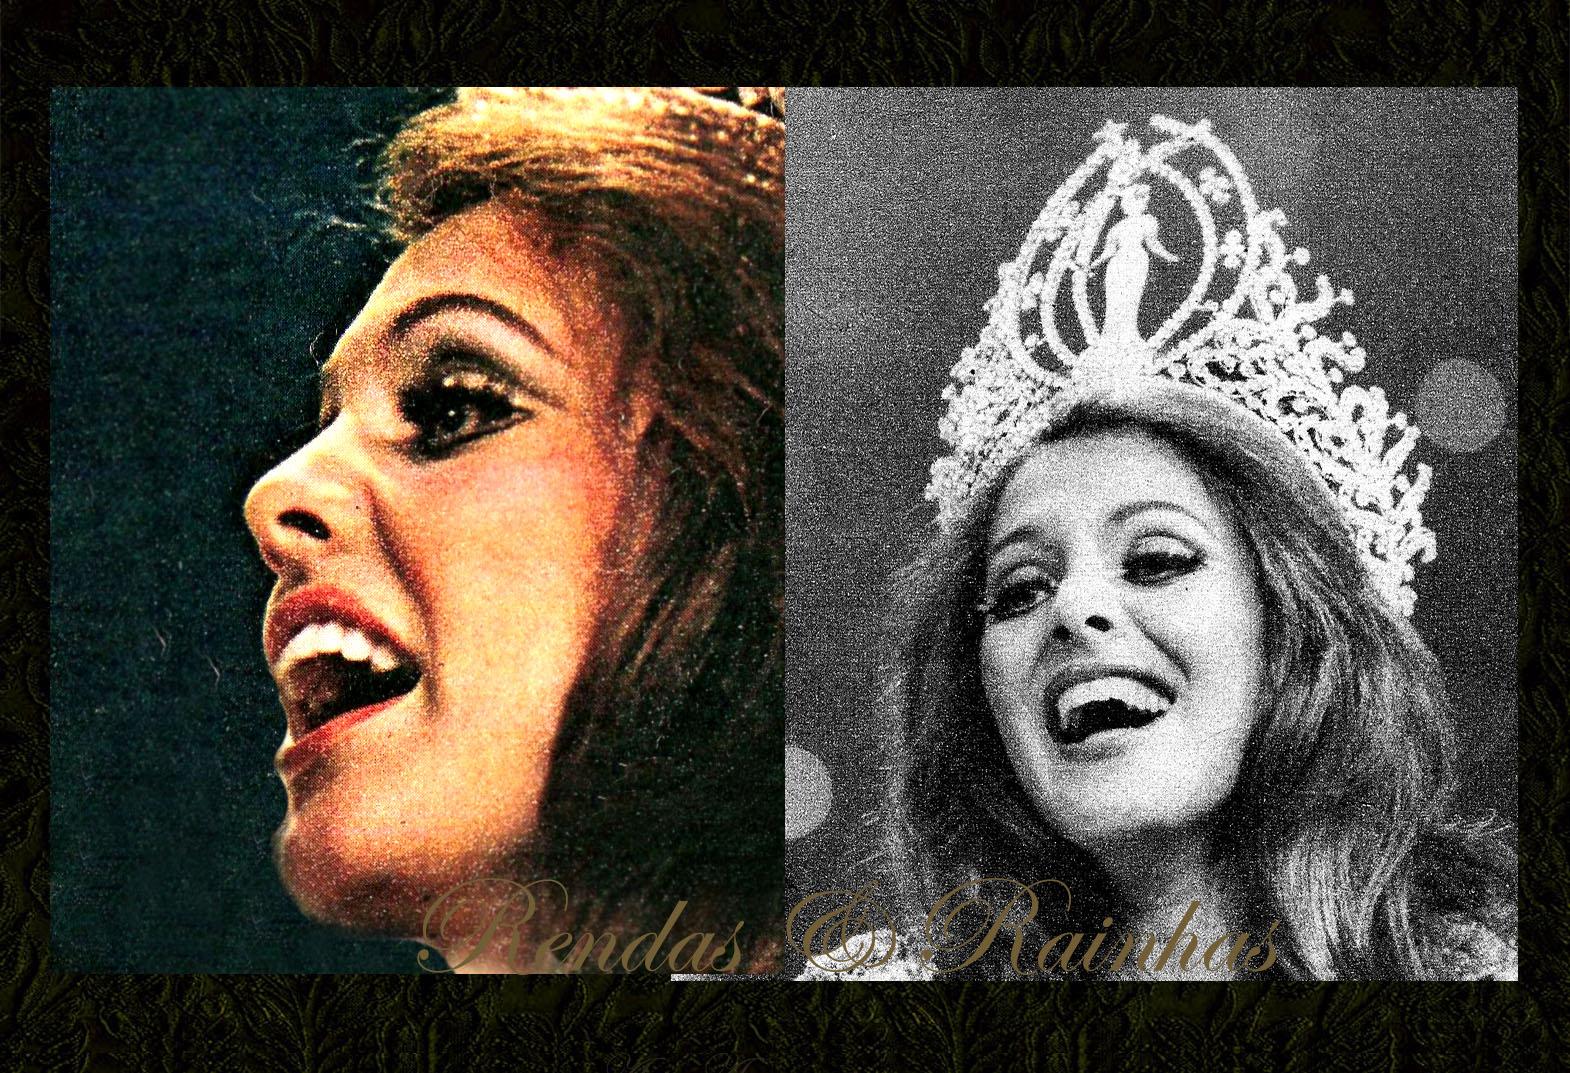 ☽ ✮ ✯ ✰ ☆ ☁ Galeria de Martha Vasconcelos, Miss Universe 1968.☽ ✮ ✯ ✰ ☆ ☁ - Página 2 MARTA+COM+coroada+68